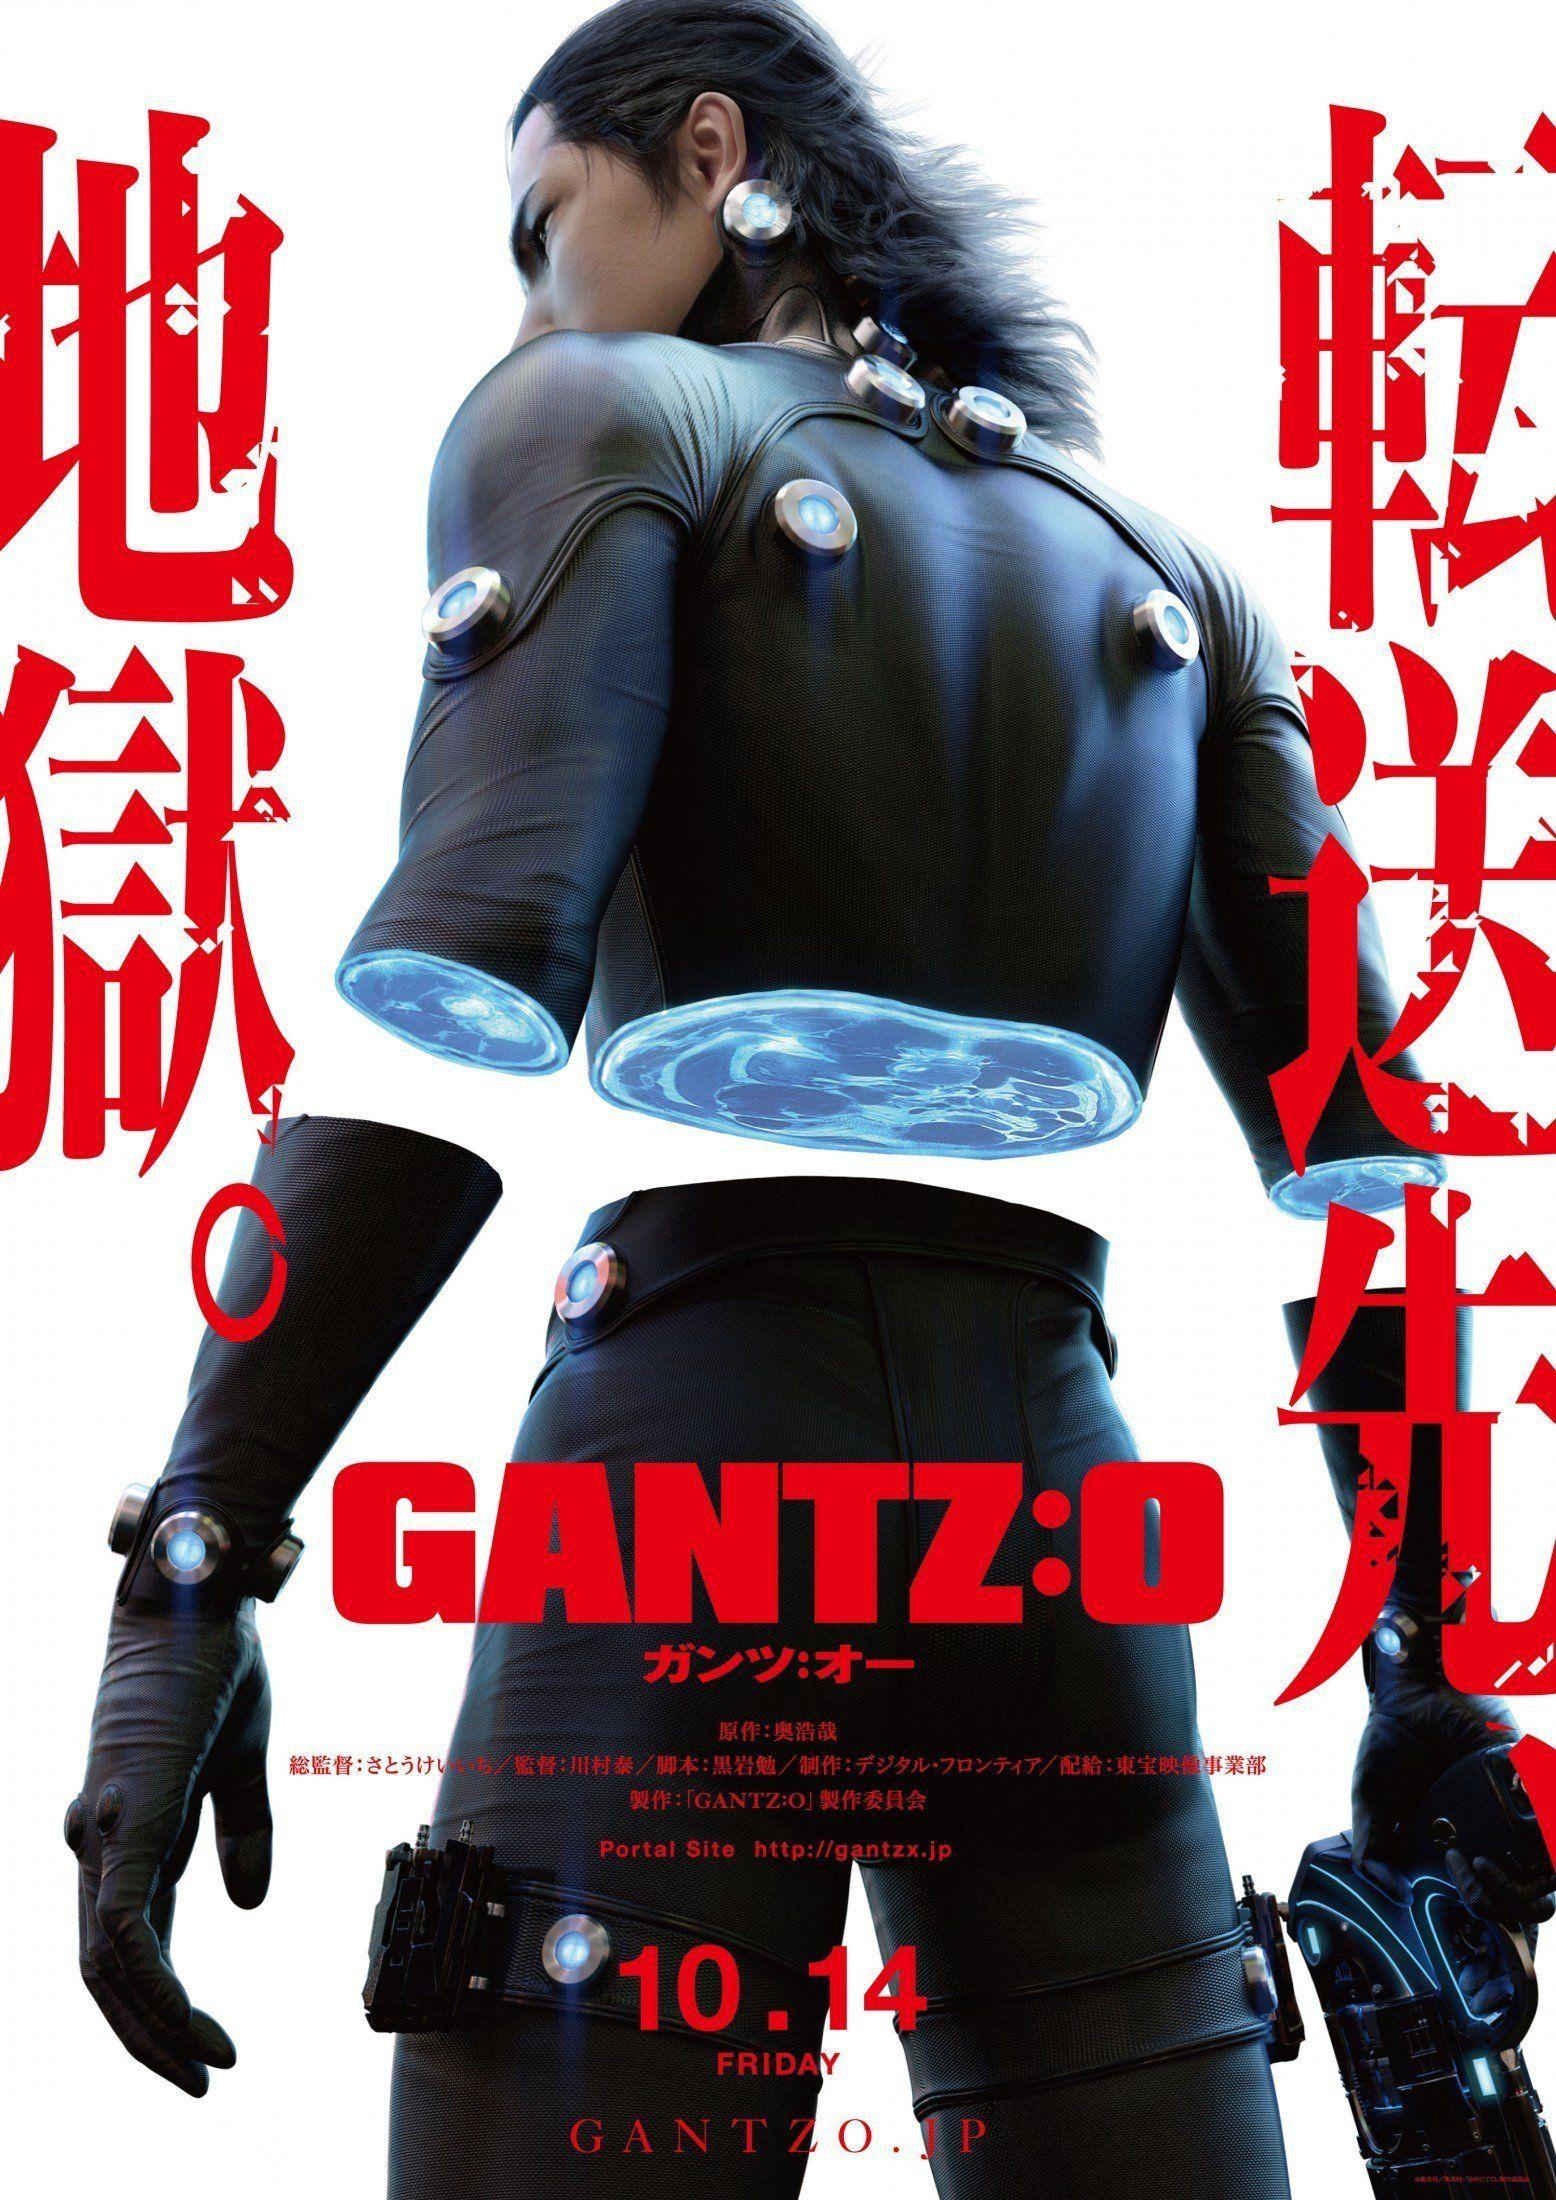 Gantz O 2016 Movie Review Japanese movie poster